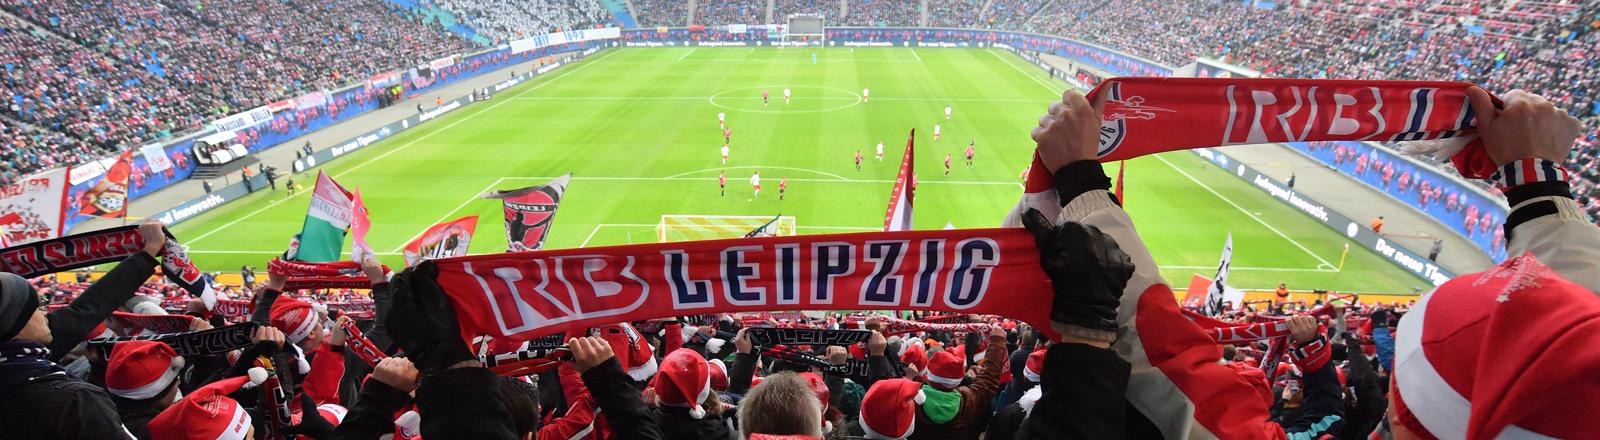 Stadion in Leipzig